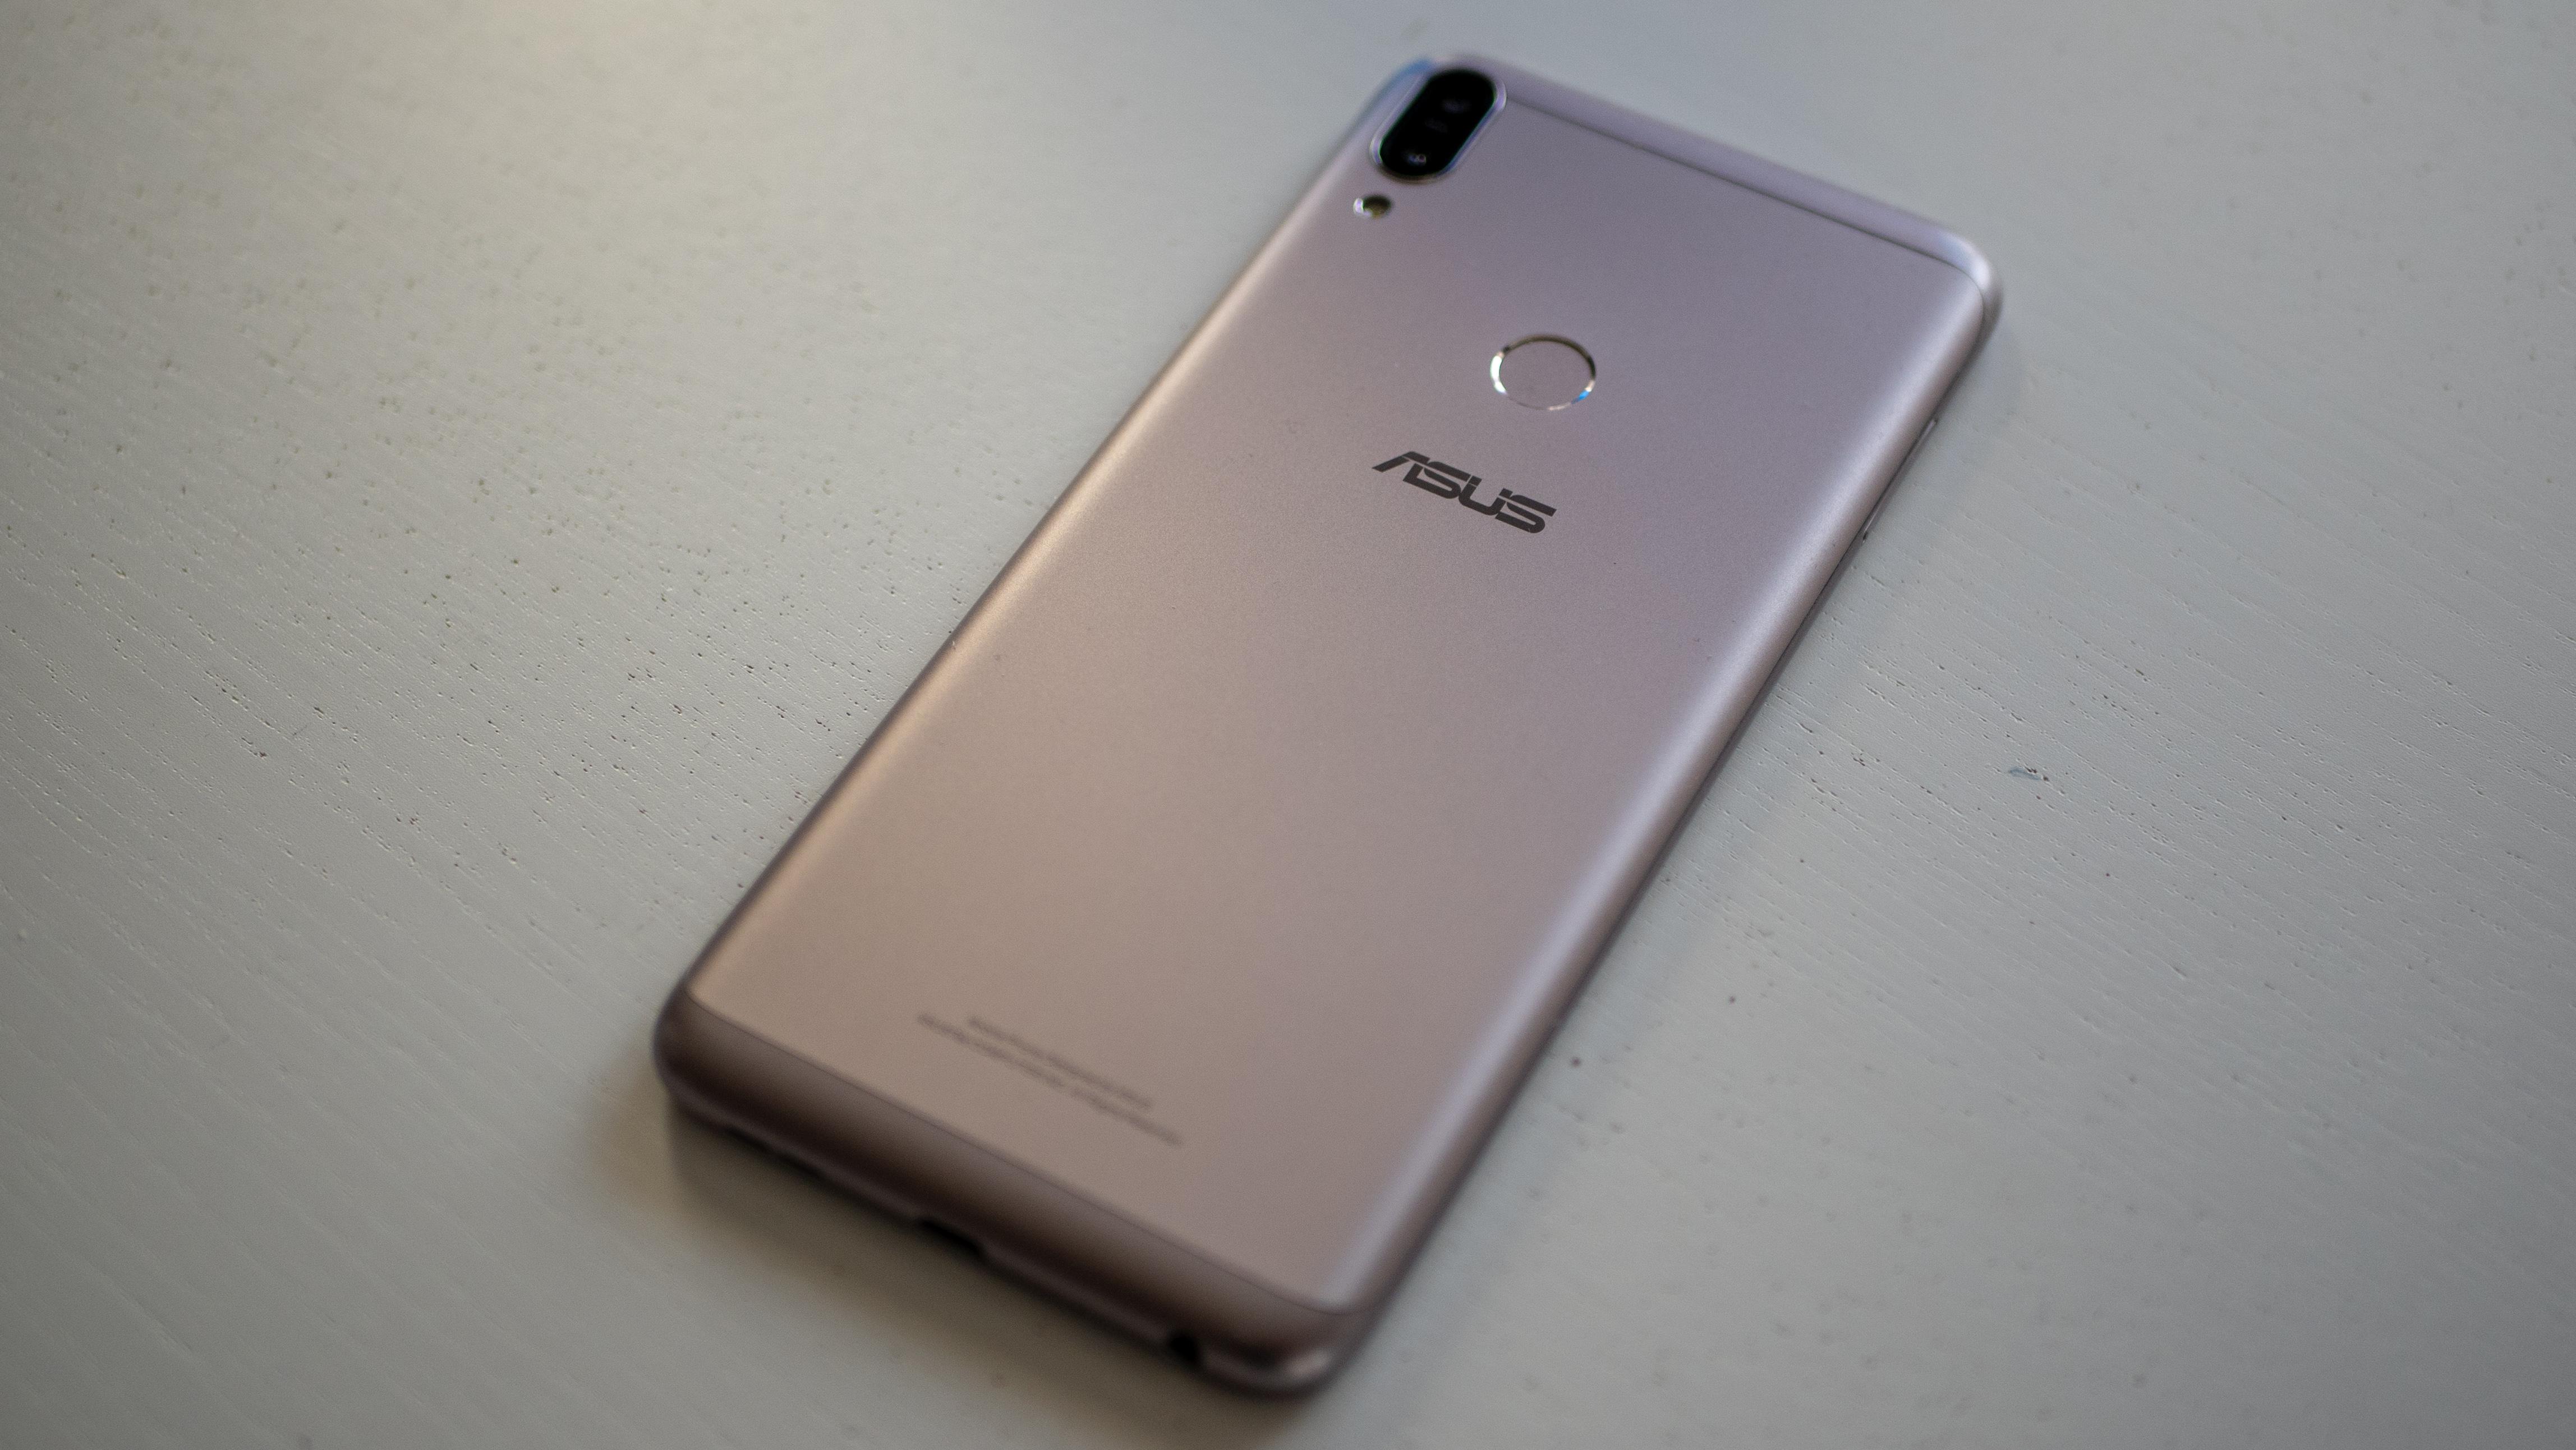 Asus Zenfone Max Pro har et helt ordinært design, og det er egentlig helt OK.